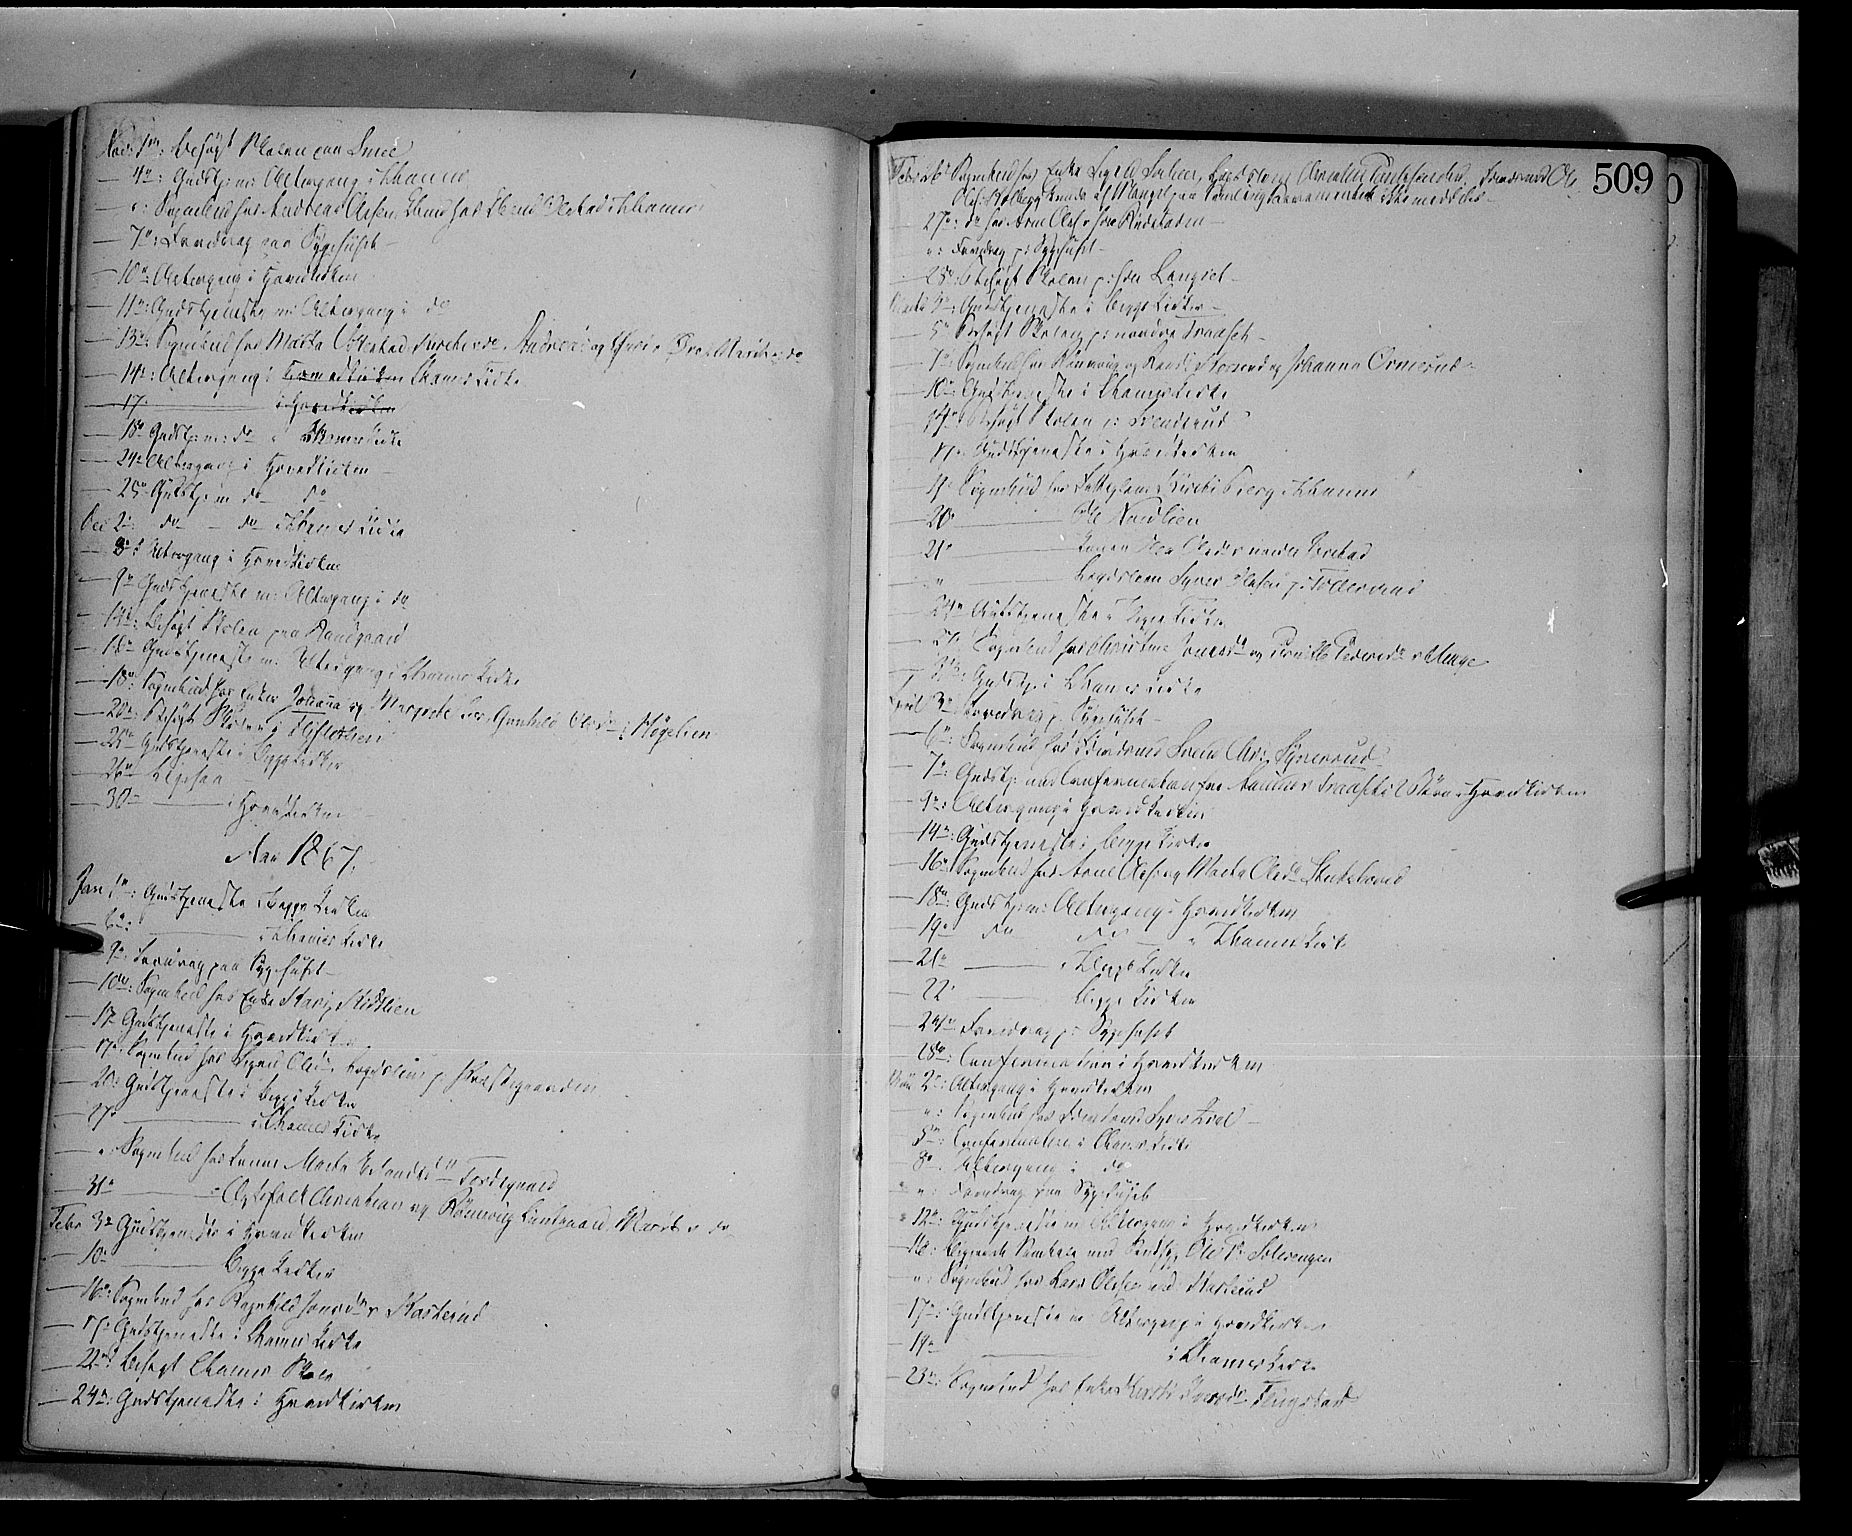 SAH, Fåberg prestekontor, Ministerialbok nr. 6B, 1855-1867, s. 509